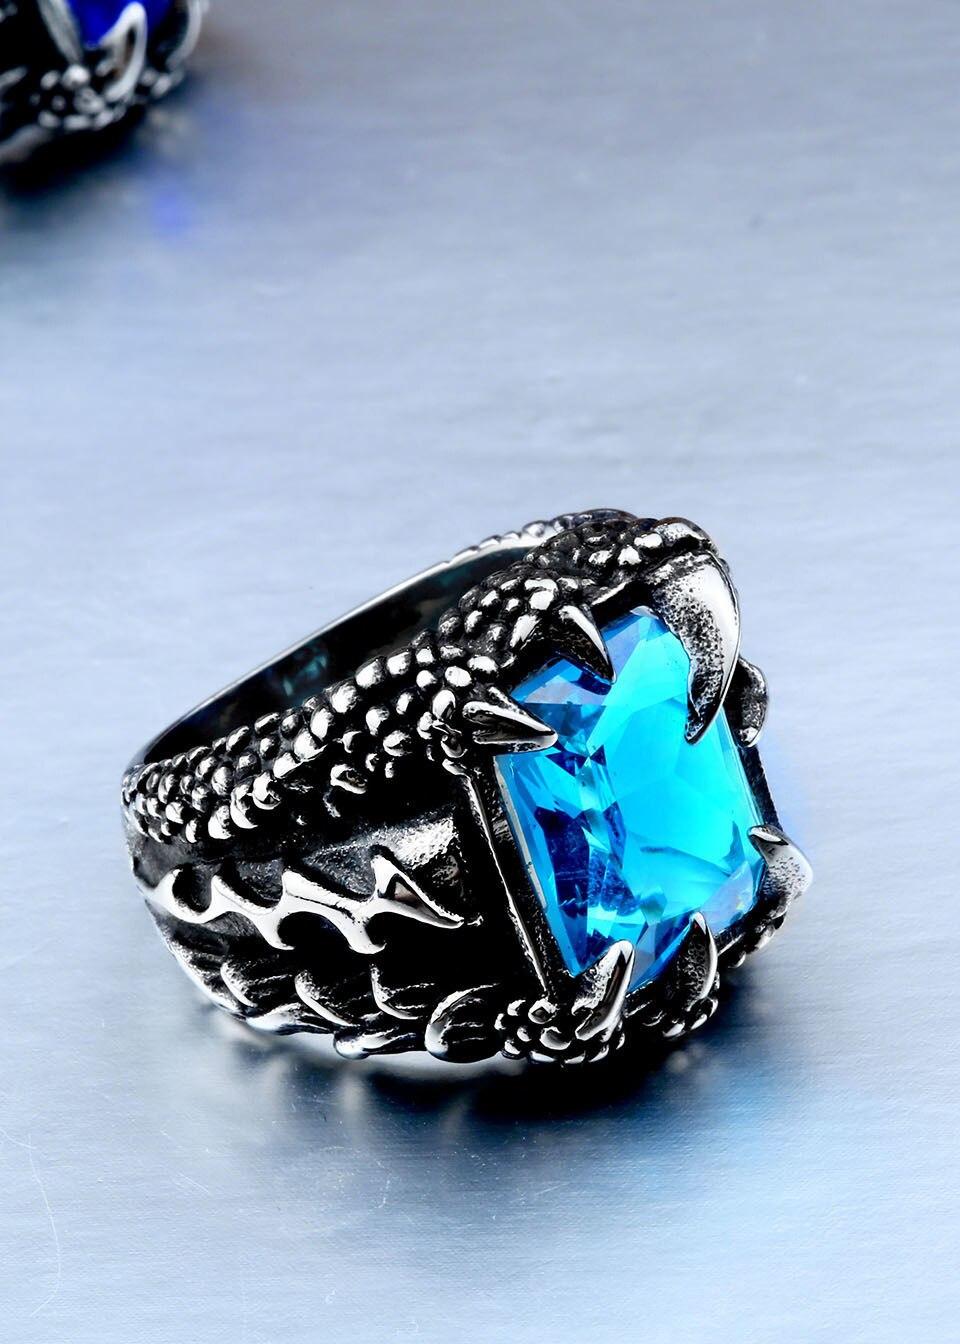 Hbd13d9fa85114e2d83ec7024dc76aa640 - Paladin Dragon Claw Ring